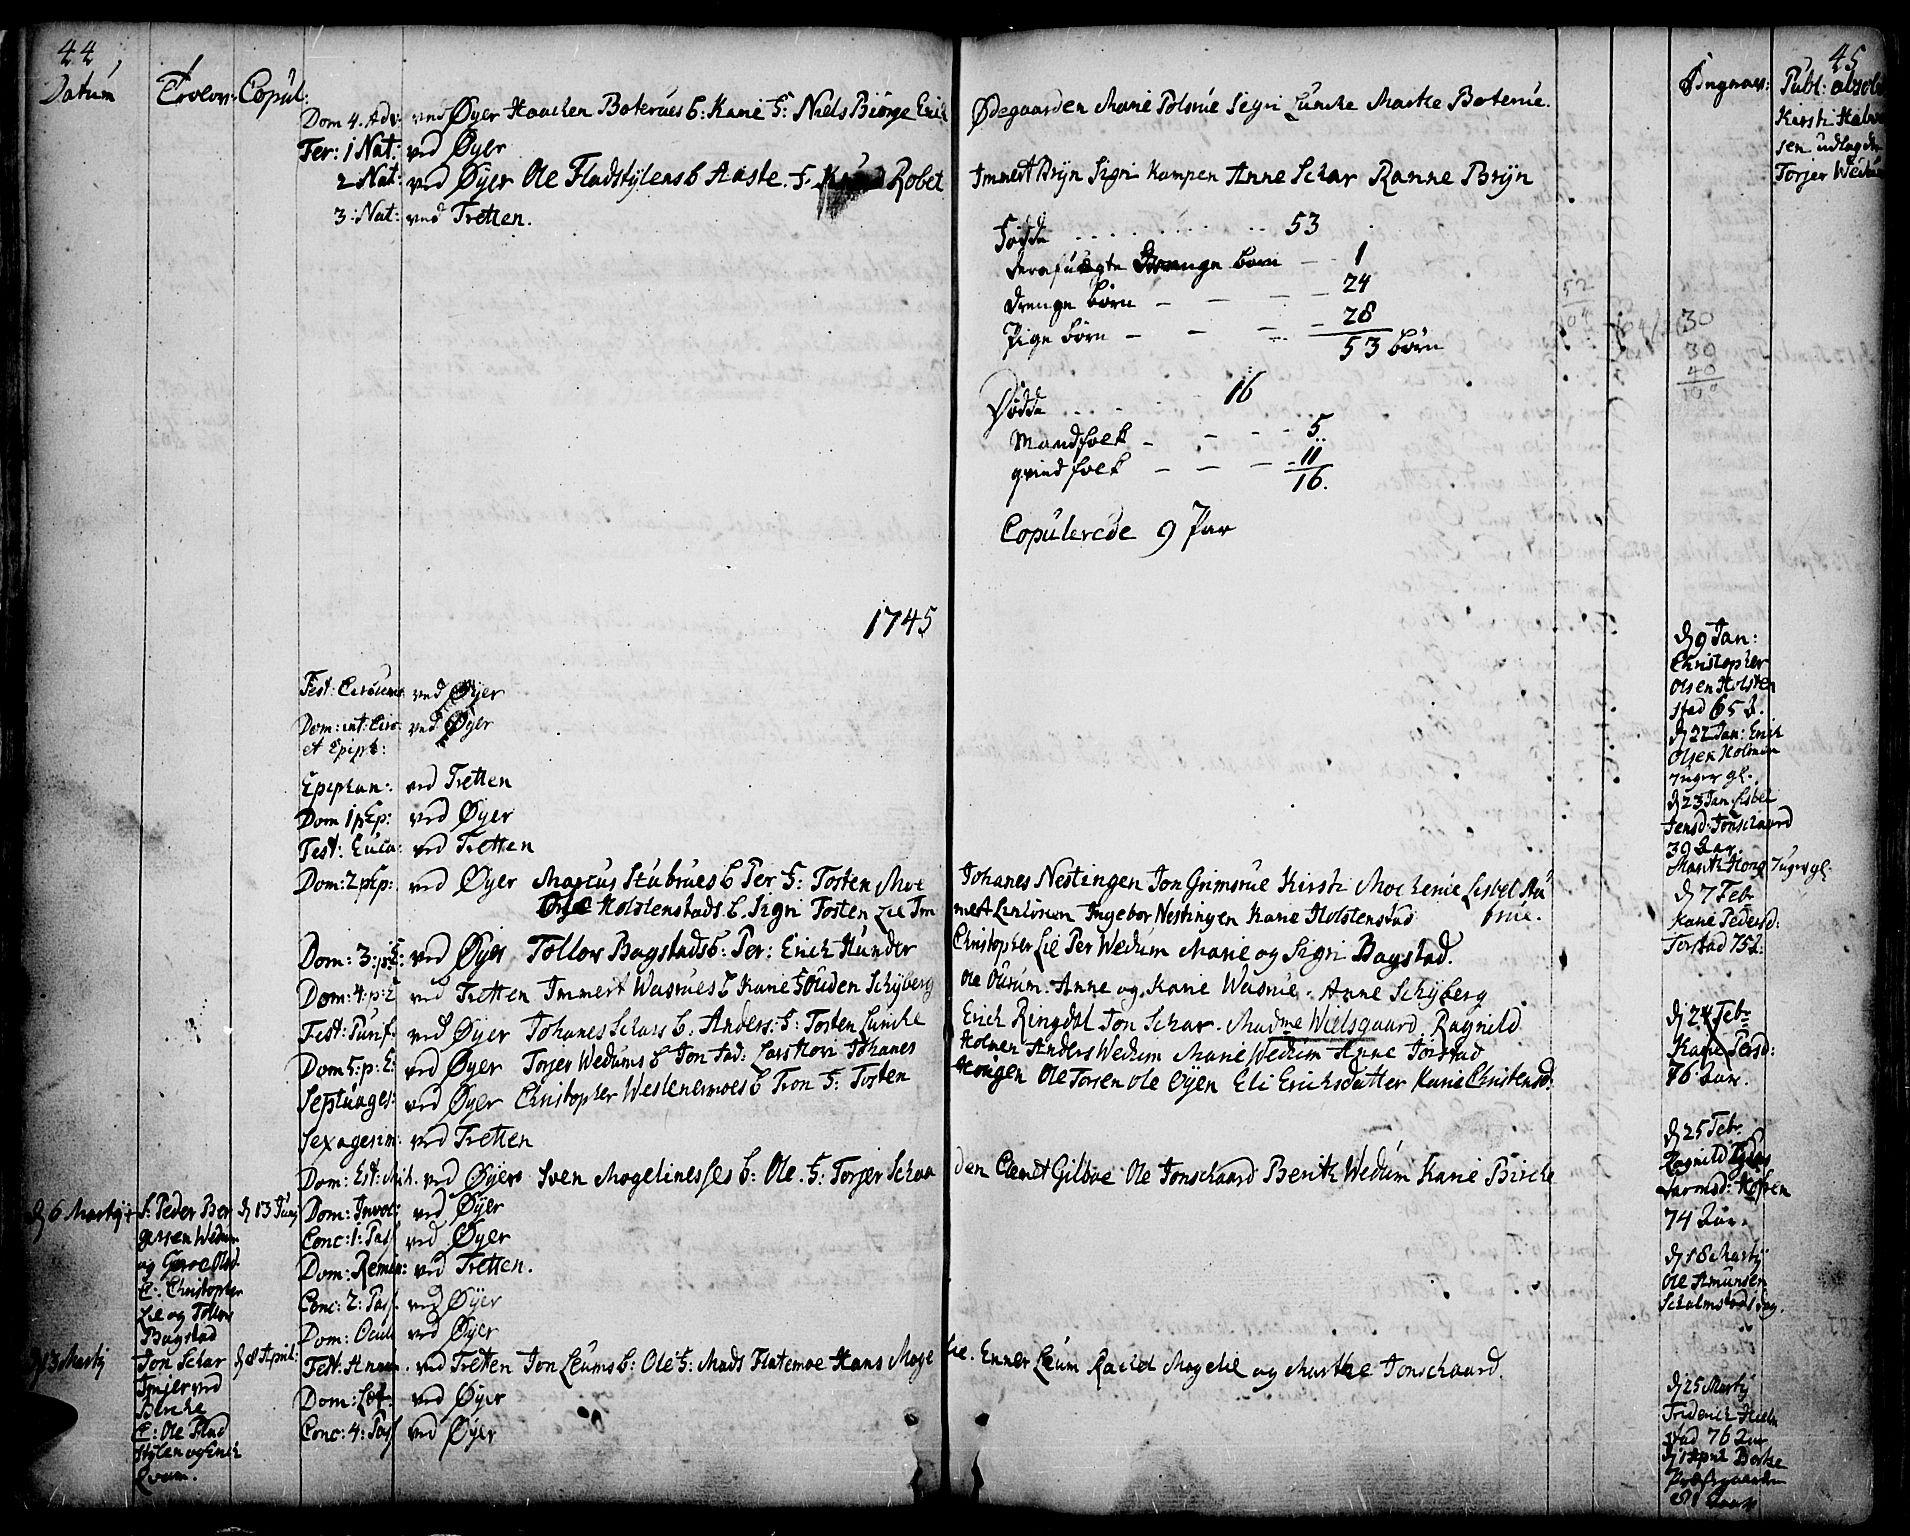 SAH, Øyer prestekontor, Ministerialbok nr. 2, 1733-1784, s. 44-45